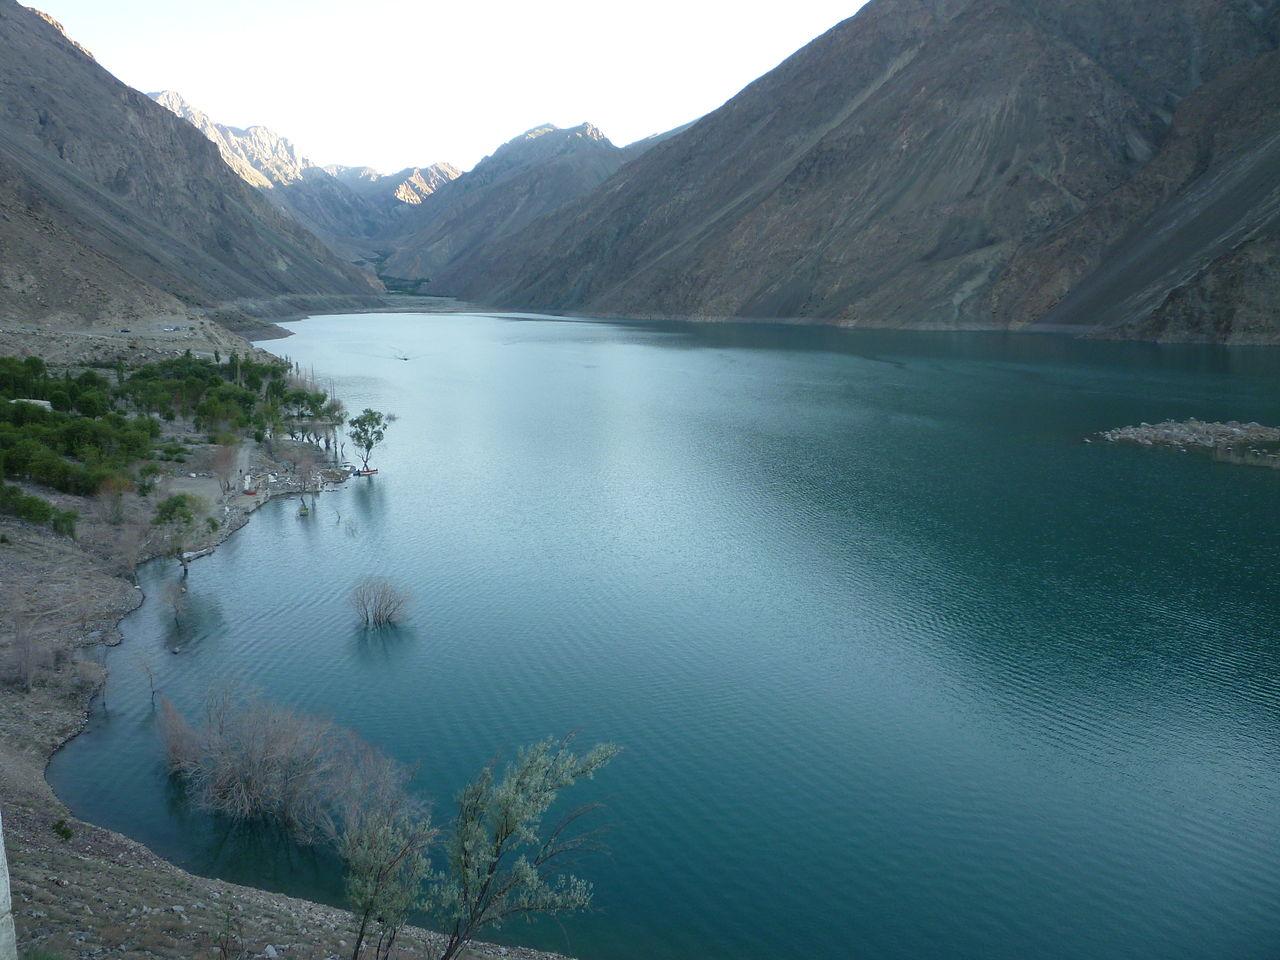 FileIndus River Gilgit Baltistan PakistanJPG